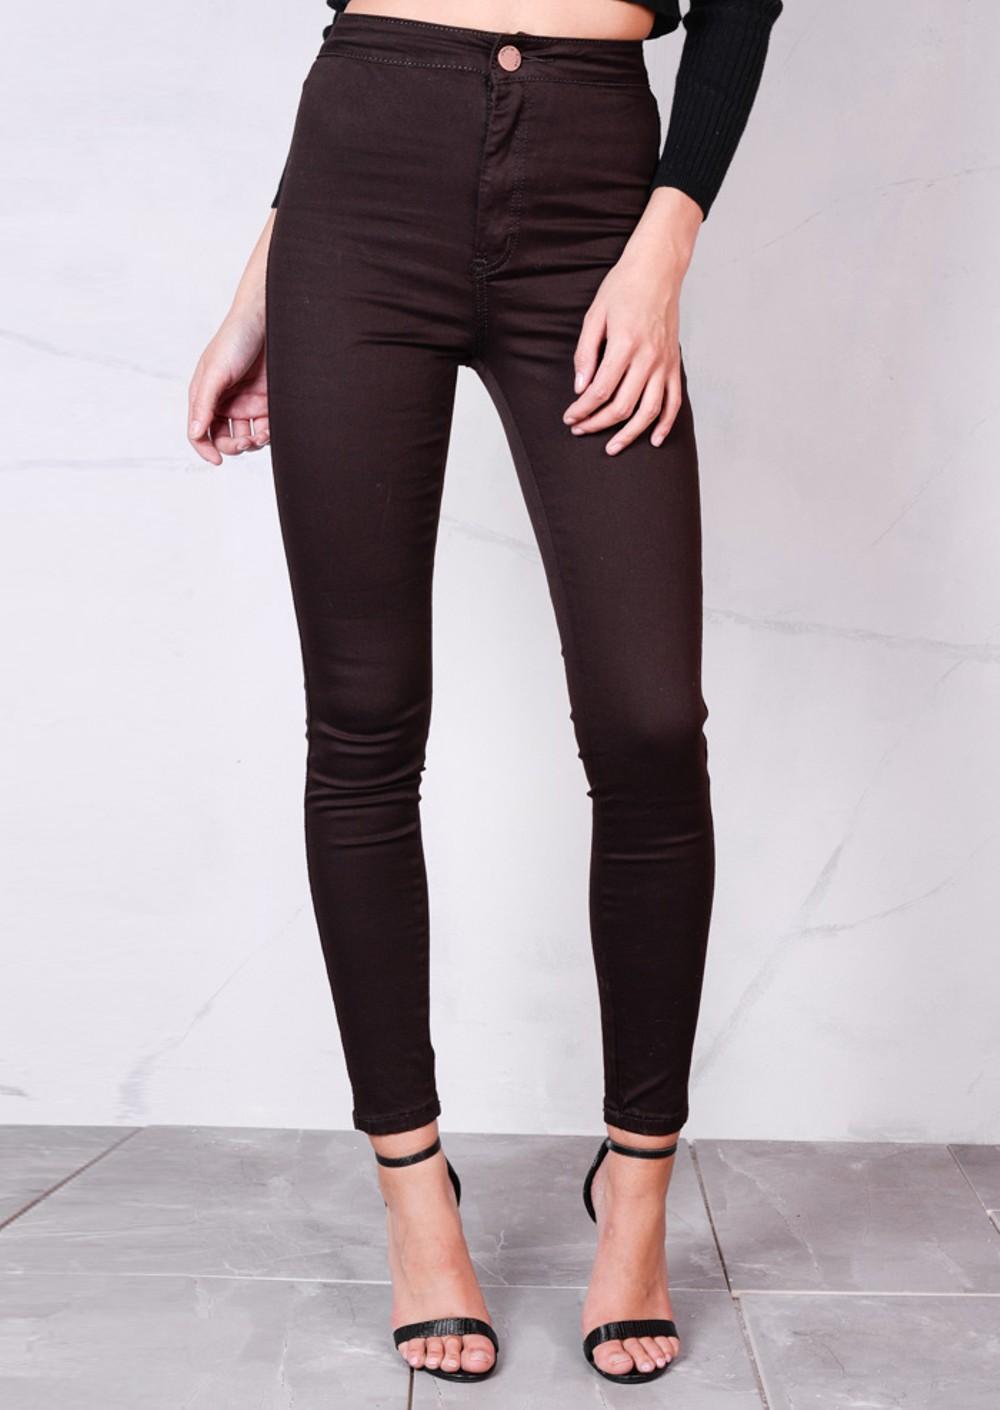 High Waisted Super Skinny Denim Jeans Brown